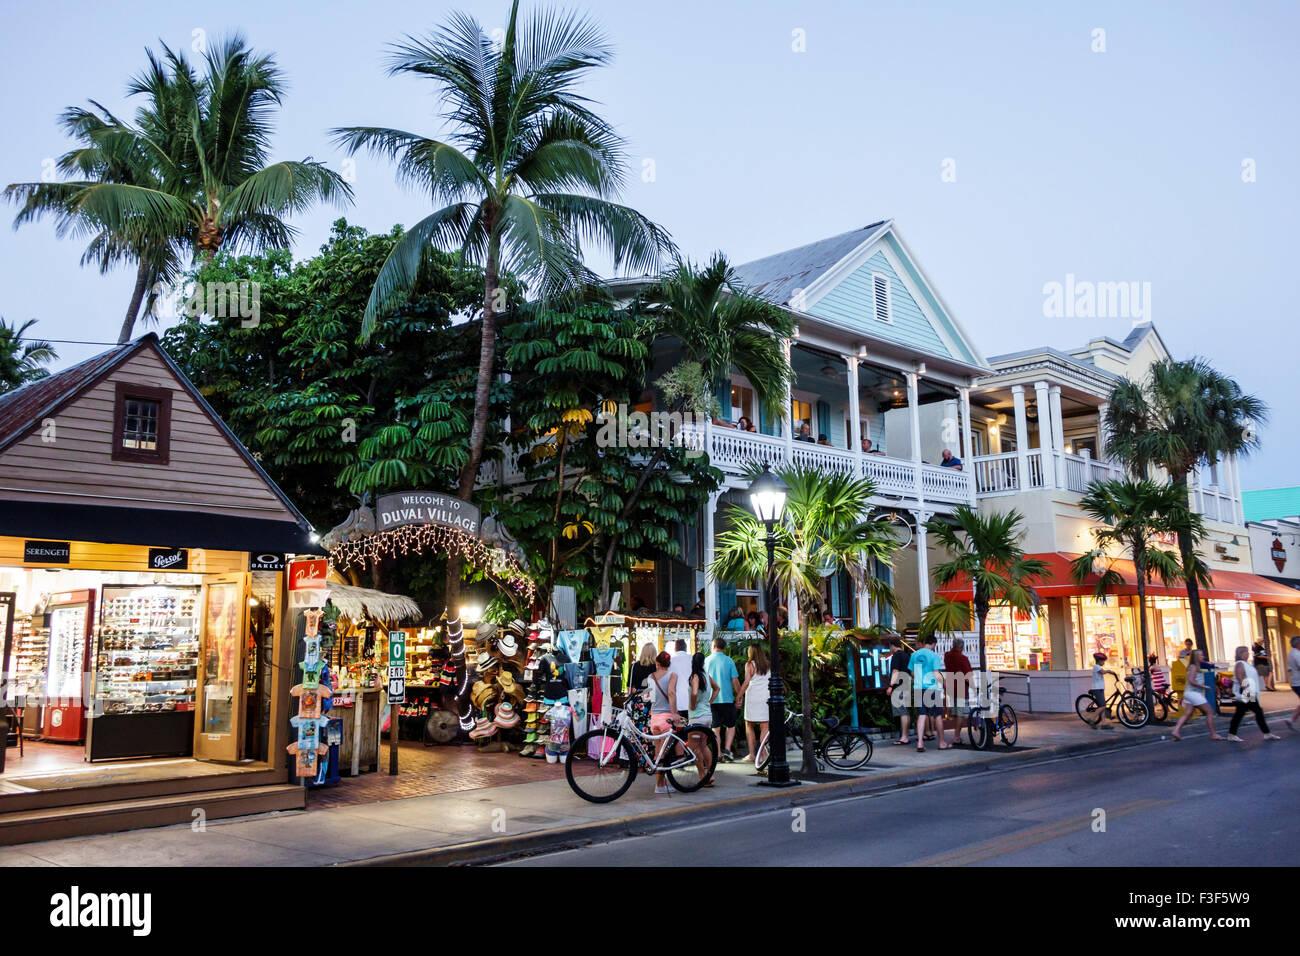 Key West Florida Keys Old Town Duval Street Village night nightlife shopping - Stock Image